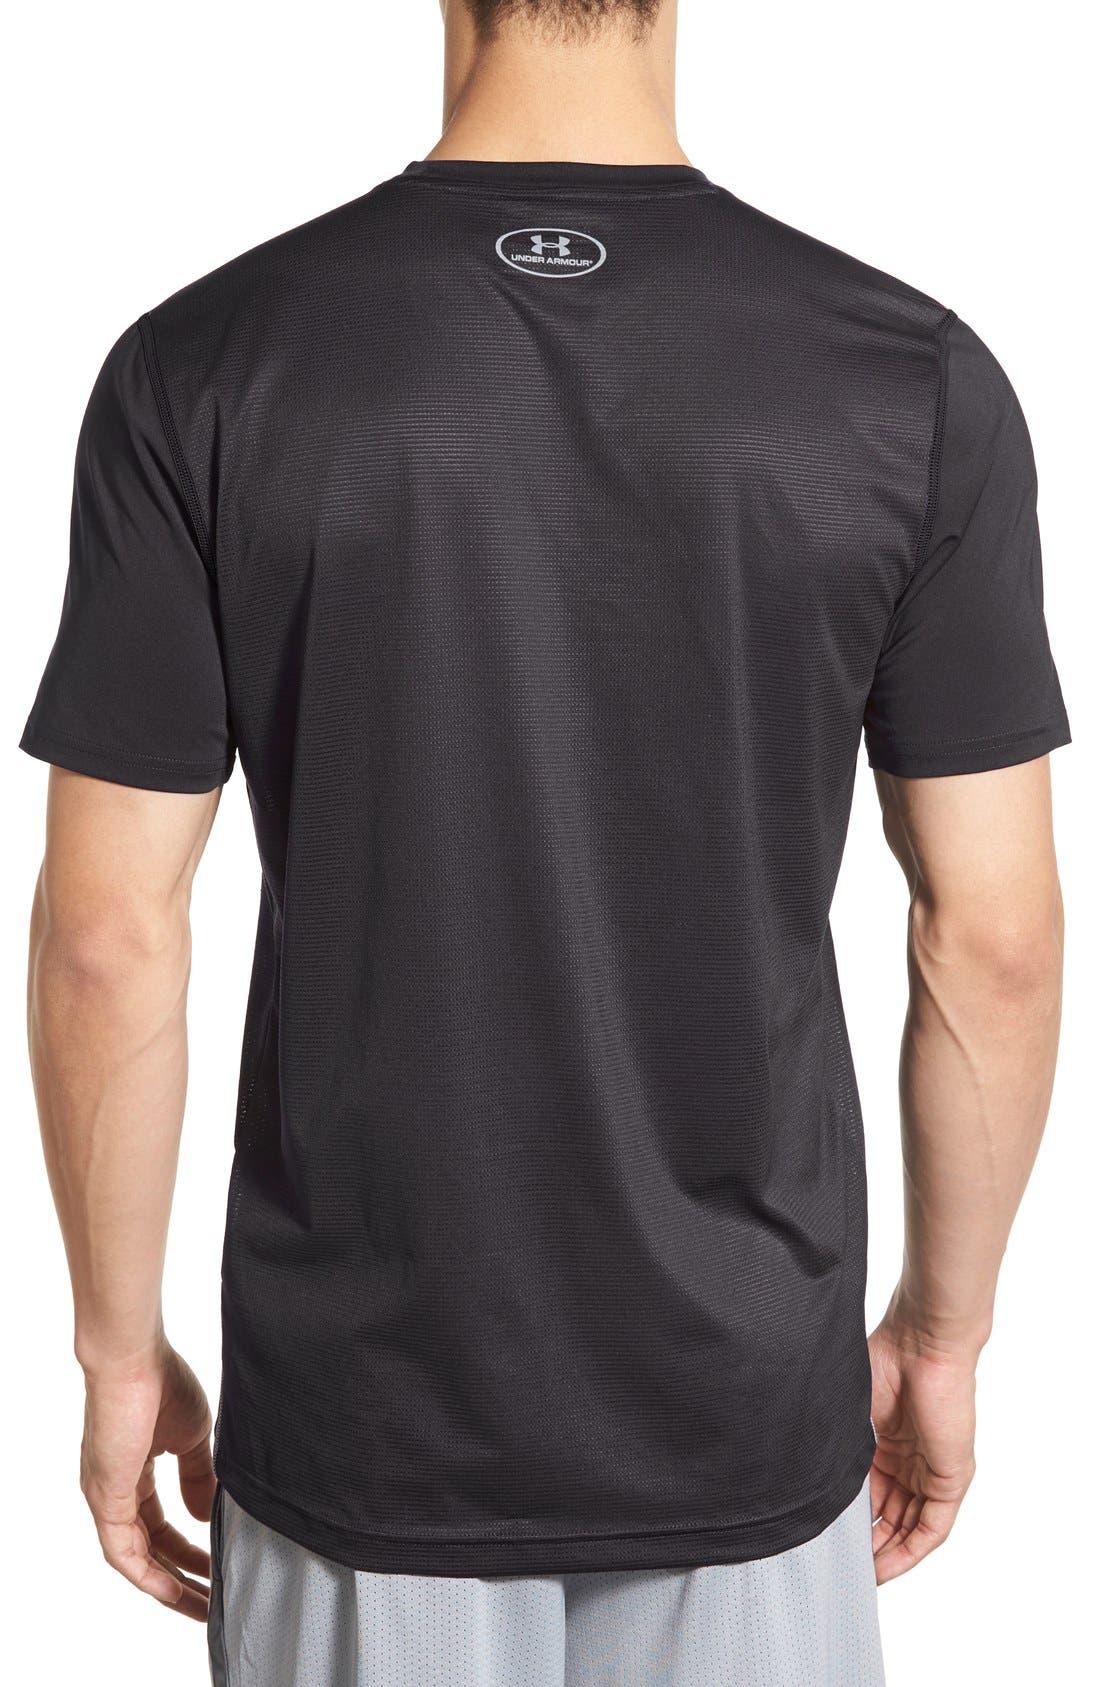 'Raid' HeatGear<sup>®</sup> Training T-Shirt,                             Alternate thumbnail 5, color,                             Black/ Black/ Graphite